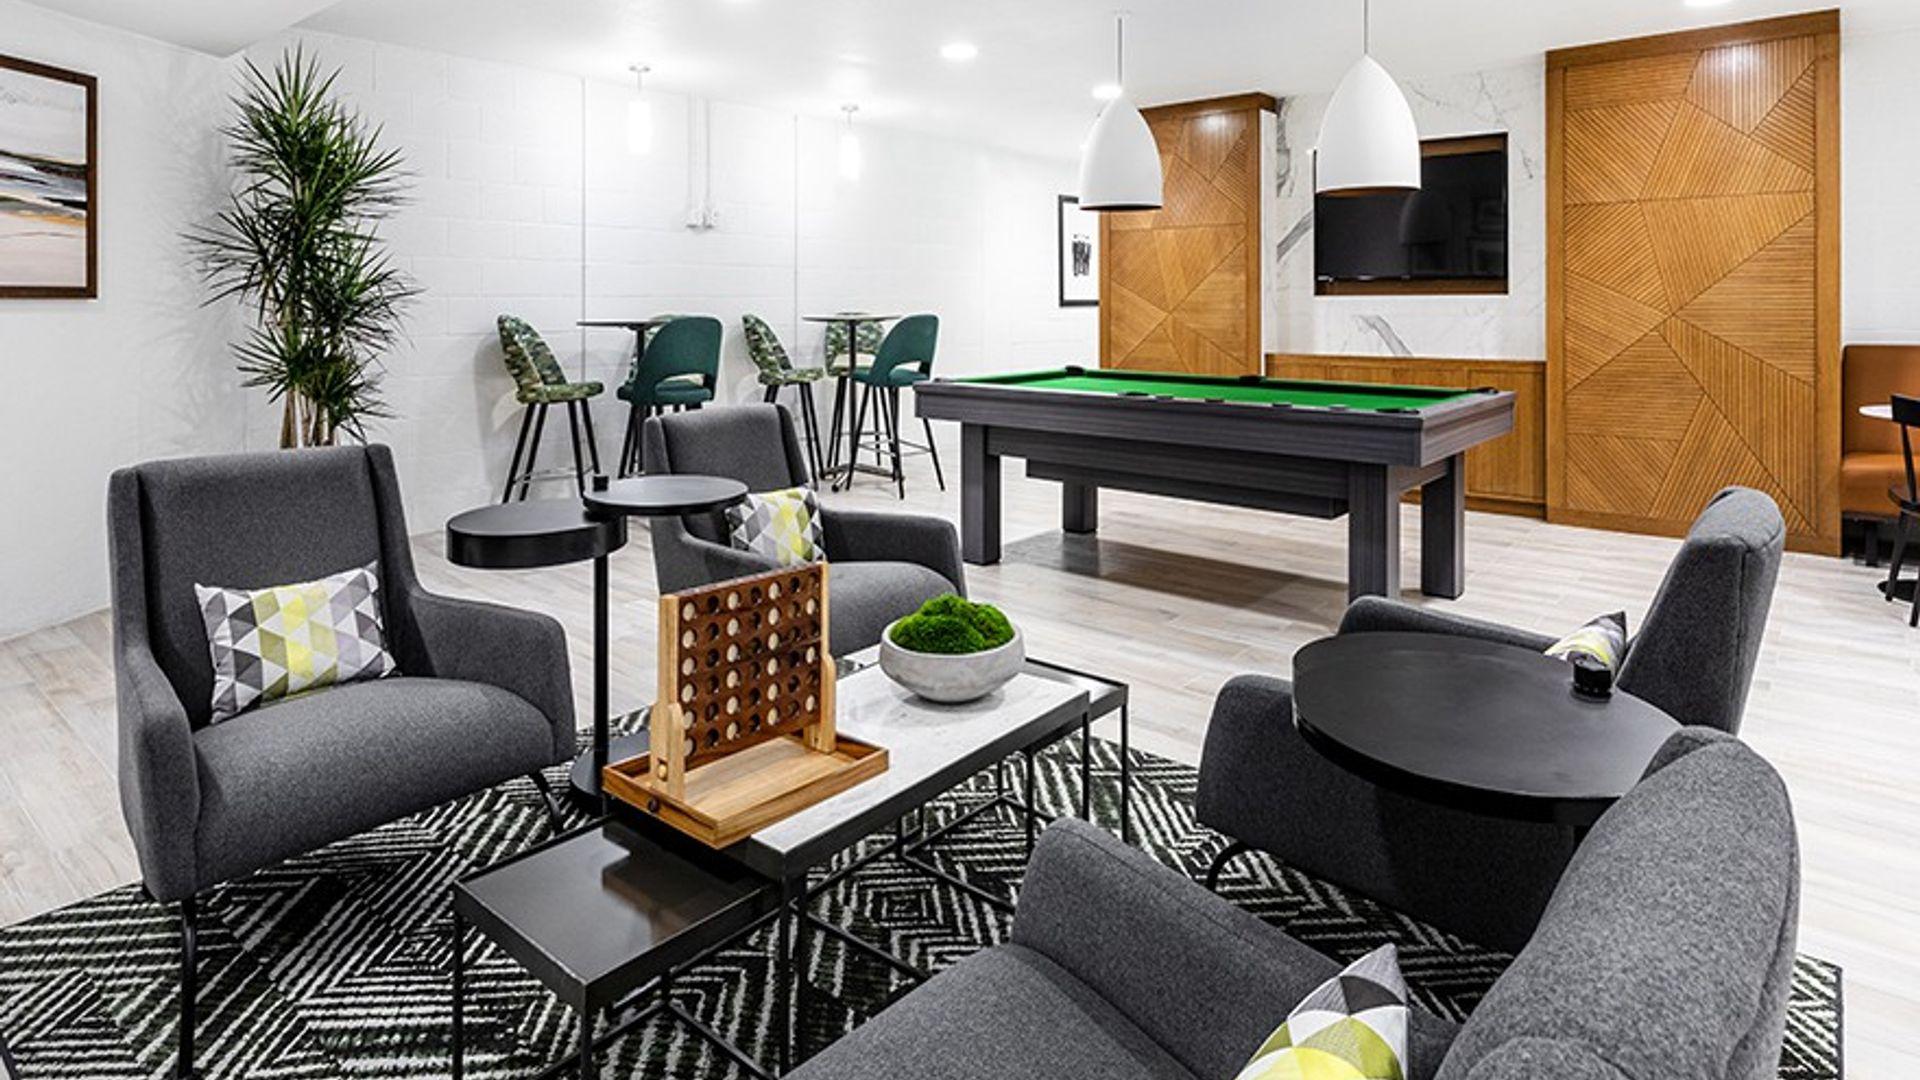 1 bed apartment at TJ Maxx, Sepulveda Westway, Los Angeles ...